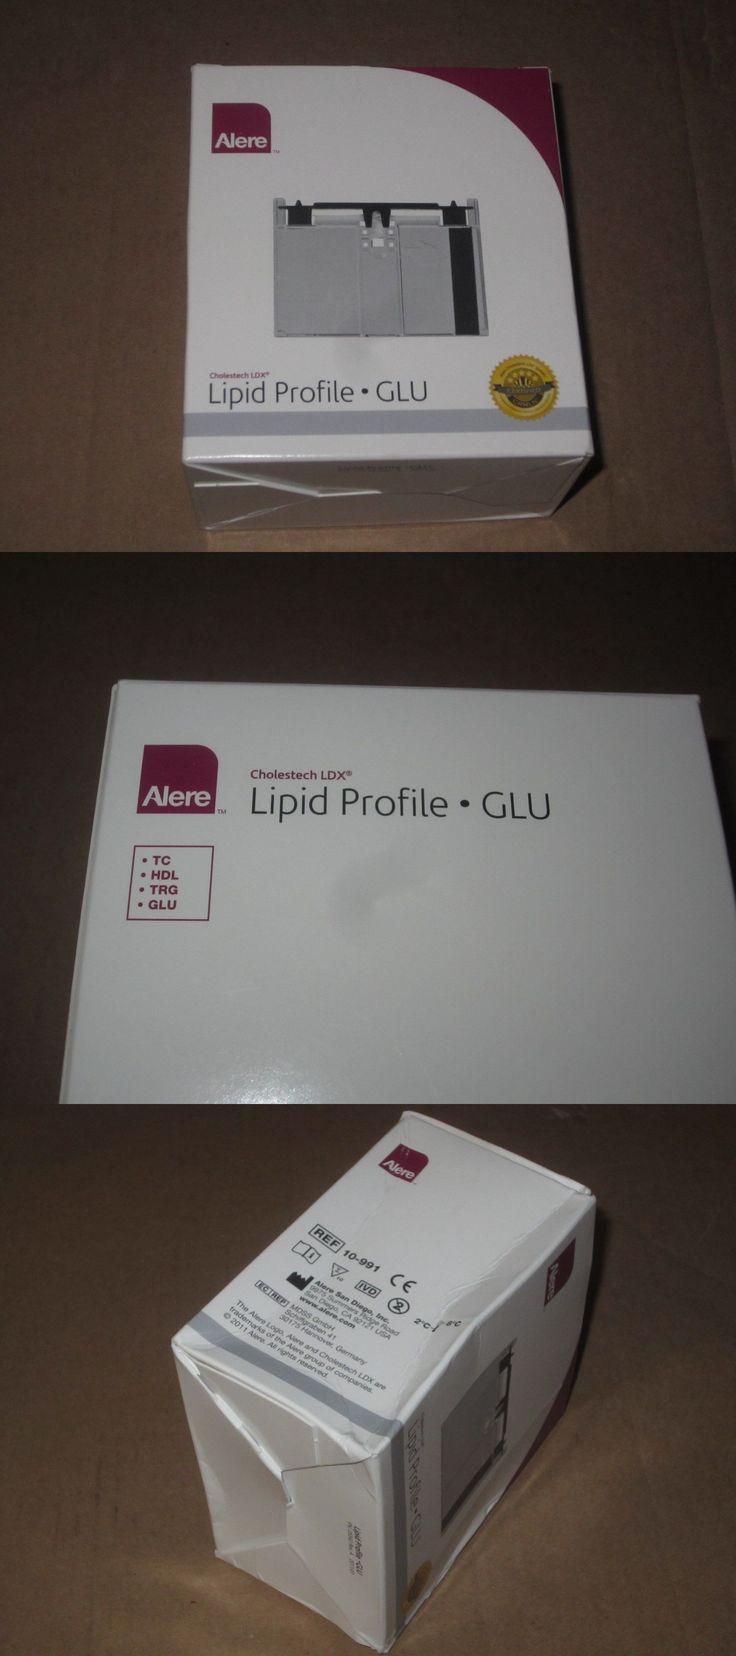 Cholesterol Testing: 10 Alere Full Lipid Profile 3 31 18 Cholestech Ldx Tc Hdl Trg Glu Cassettes Box -> BUY IT NOW ONLY: $42.49 on eBay!